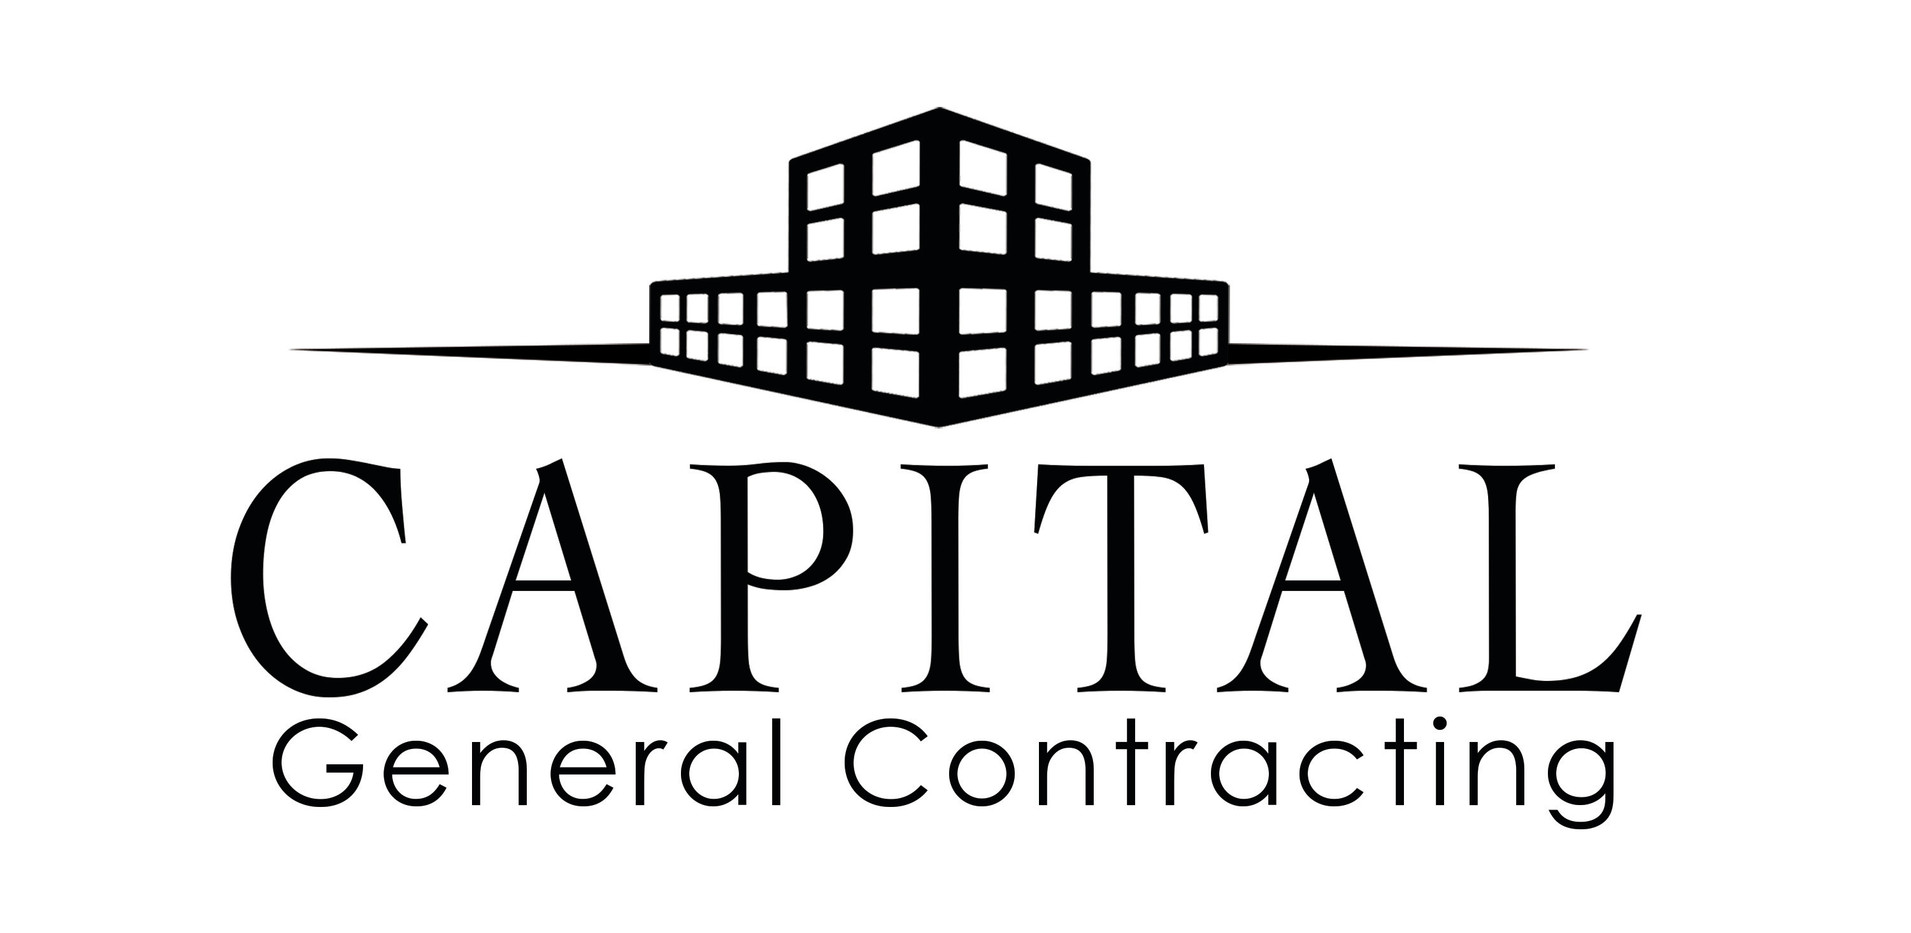 capital general contracting.jpg